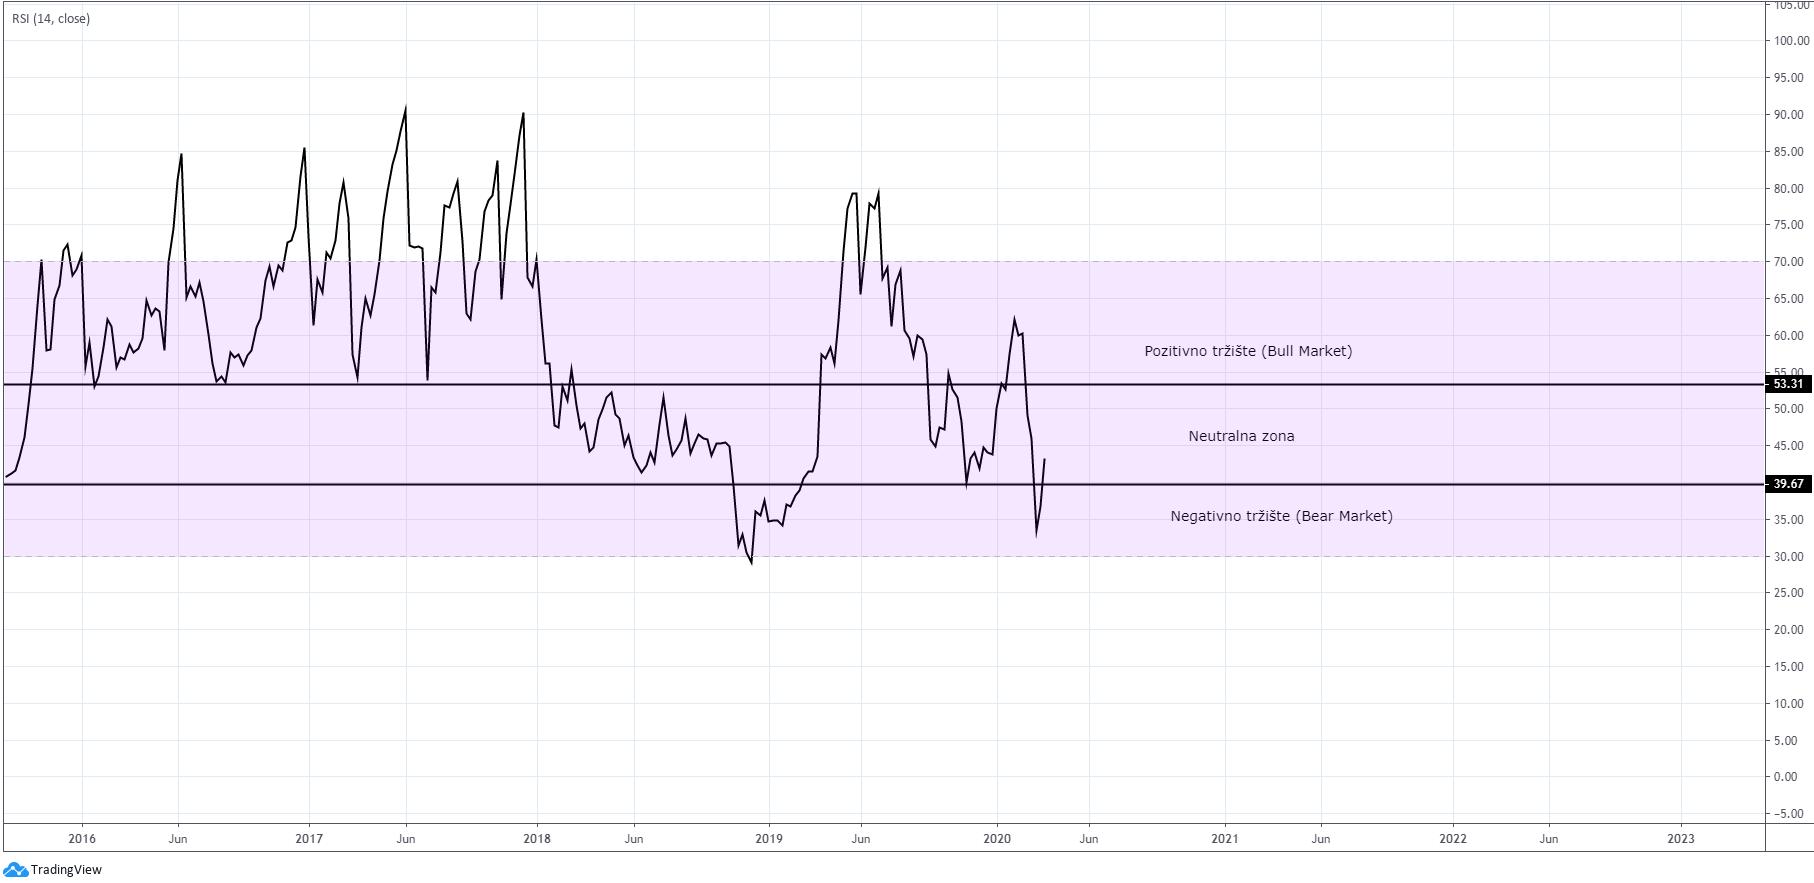 Bitkoin/dolar RSI nedeljni grafikon. Izvor: Tradingview.com